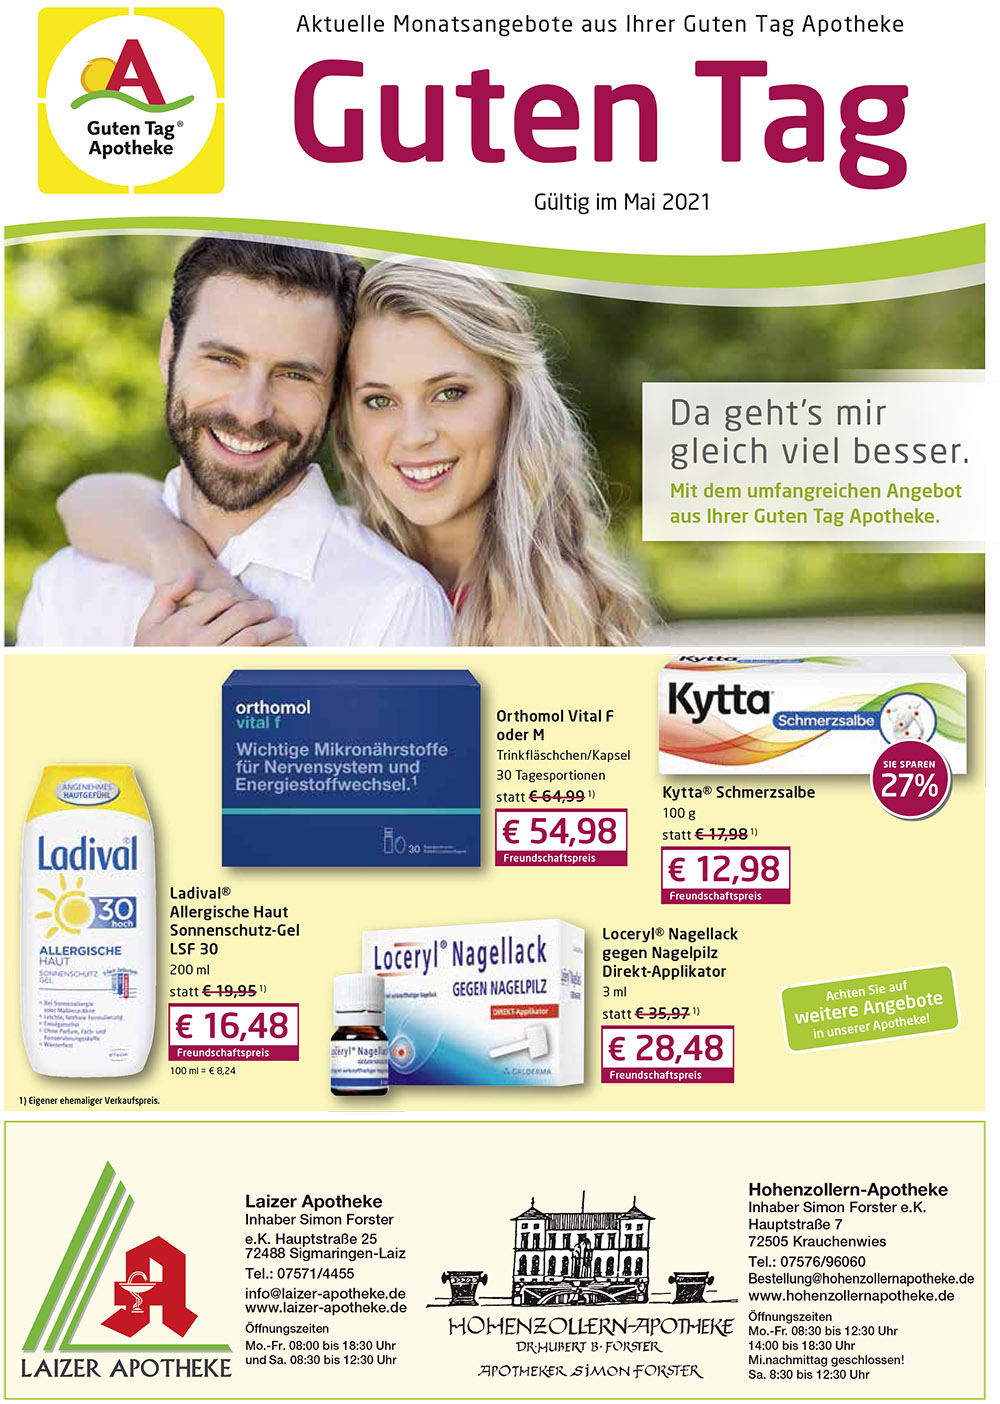 https://www.apotheken.de/fileadmin/clubarea/00000-Angebote/72488_Laizer_Angebote_1.jpg